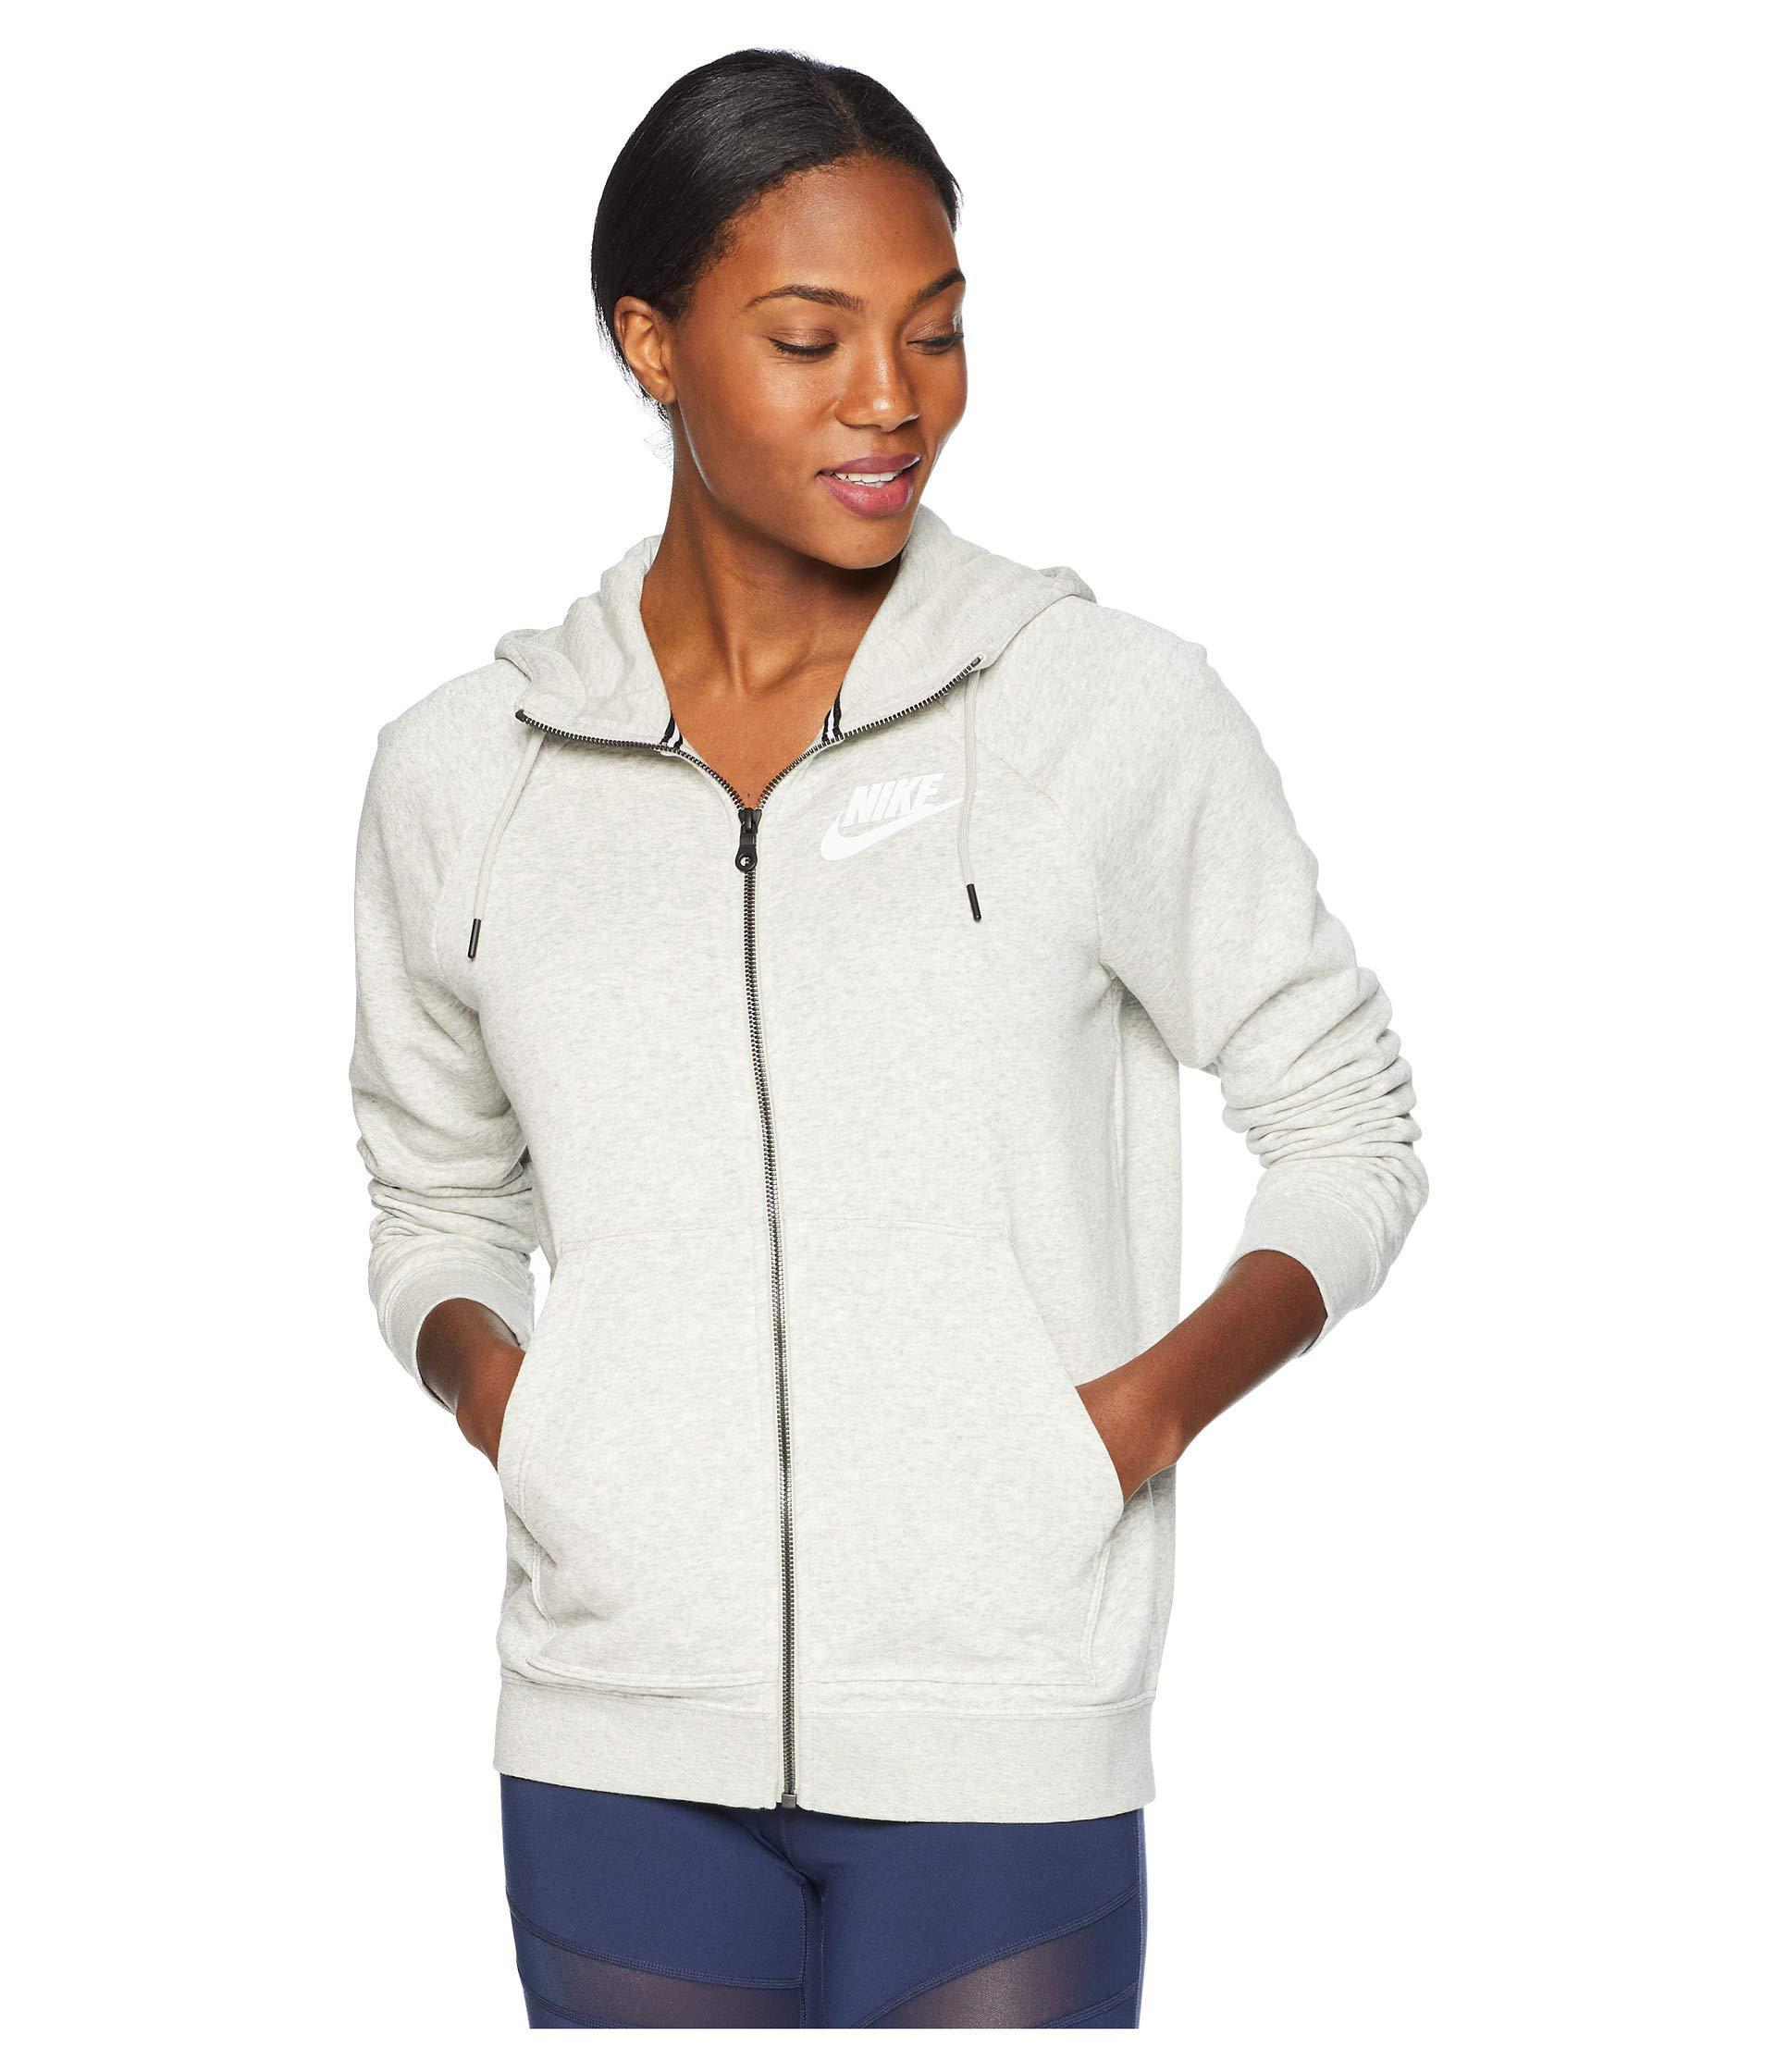 8f5eda975375 Lyst - Nike Rally Hoodie Full Zip (black black white) Women s ...